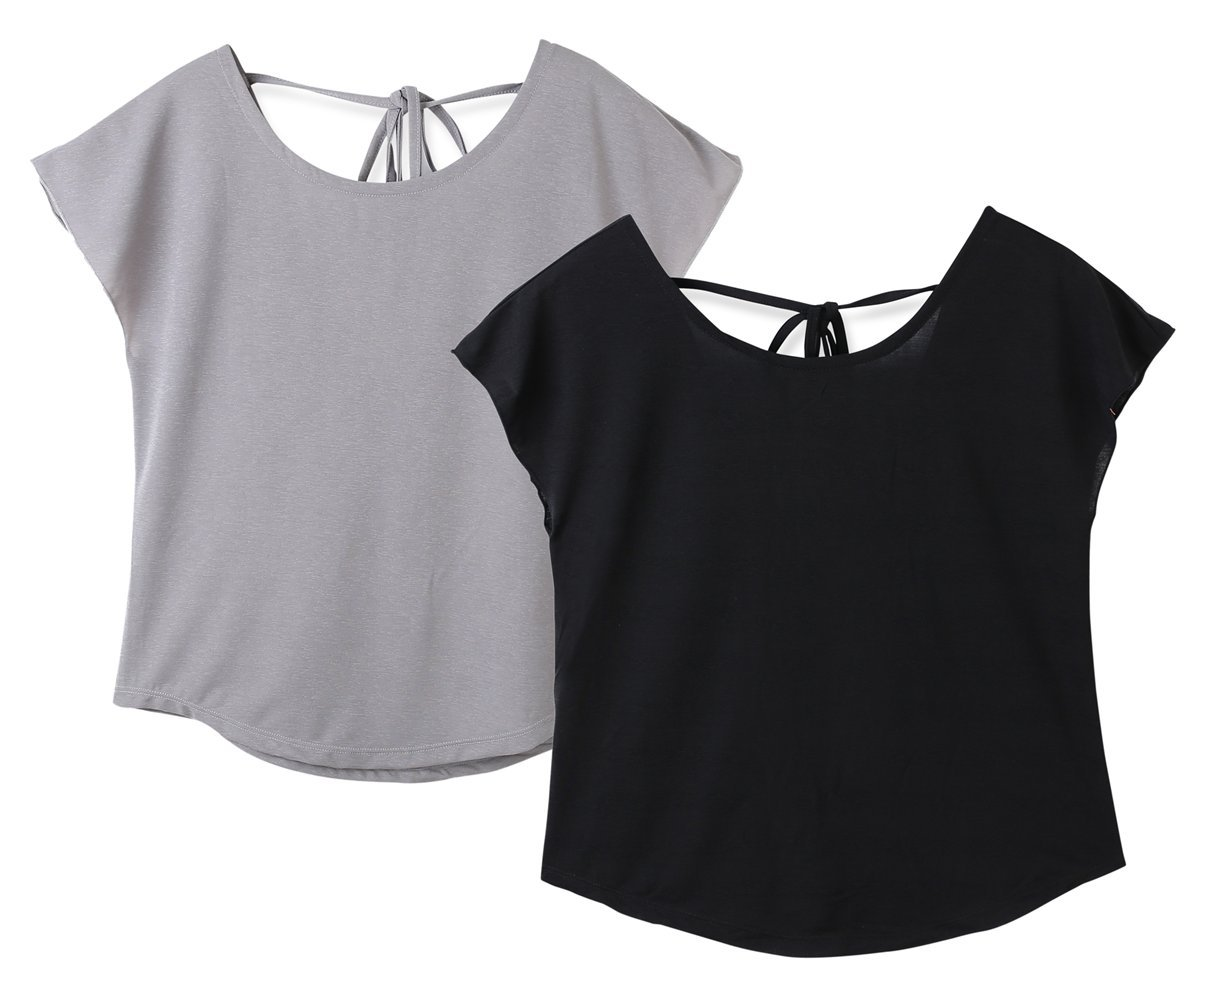 Srizgo Sport Tops Damen 1er / 2er Fitness Shirts weich schnell trocknend Yoga Tank Tops Srizgo UK